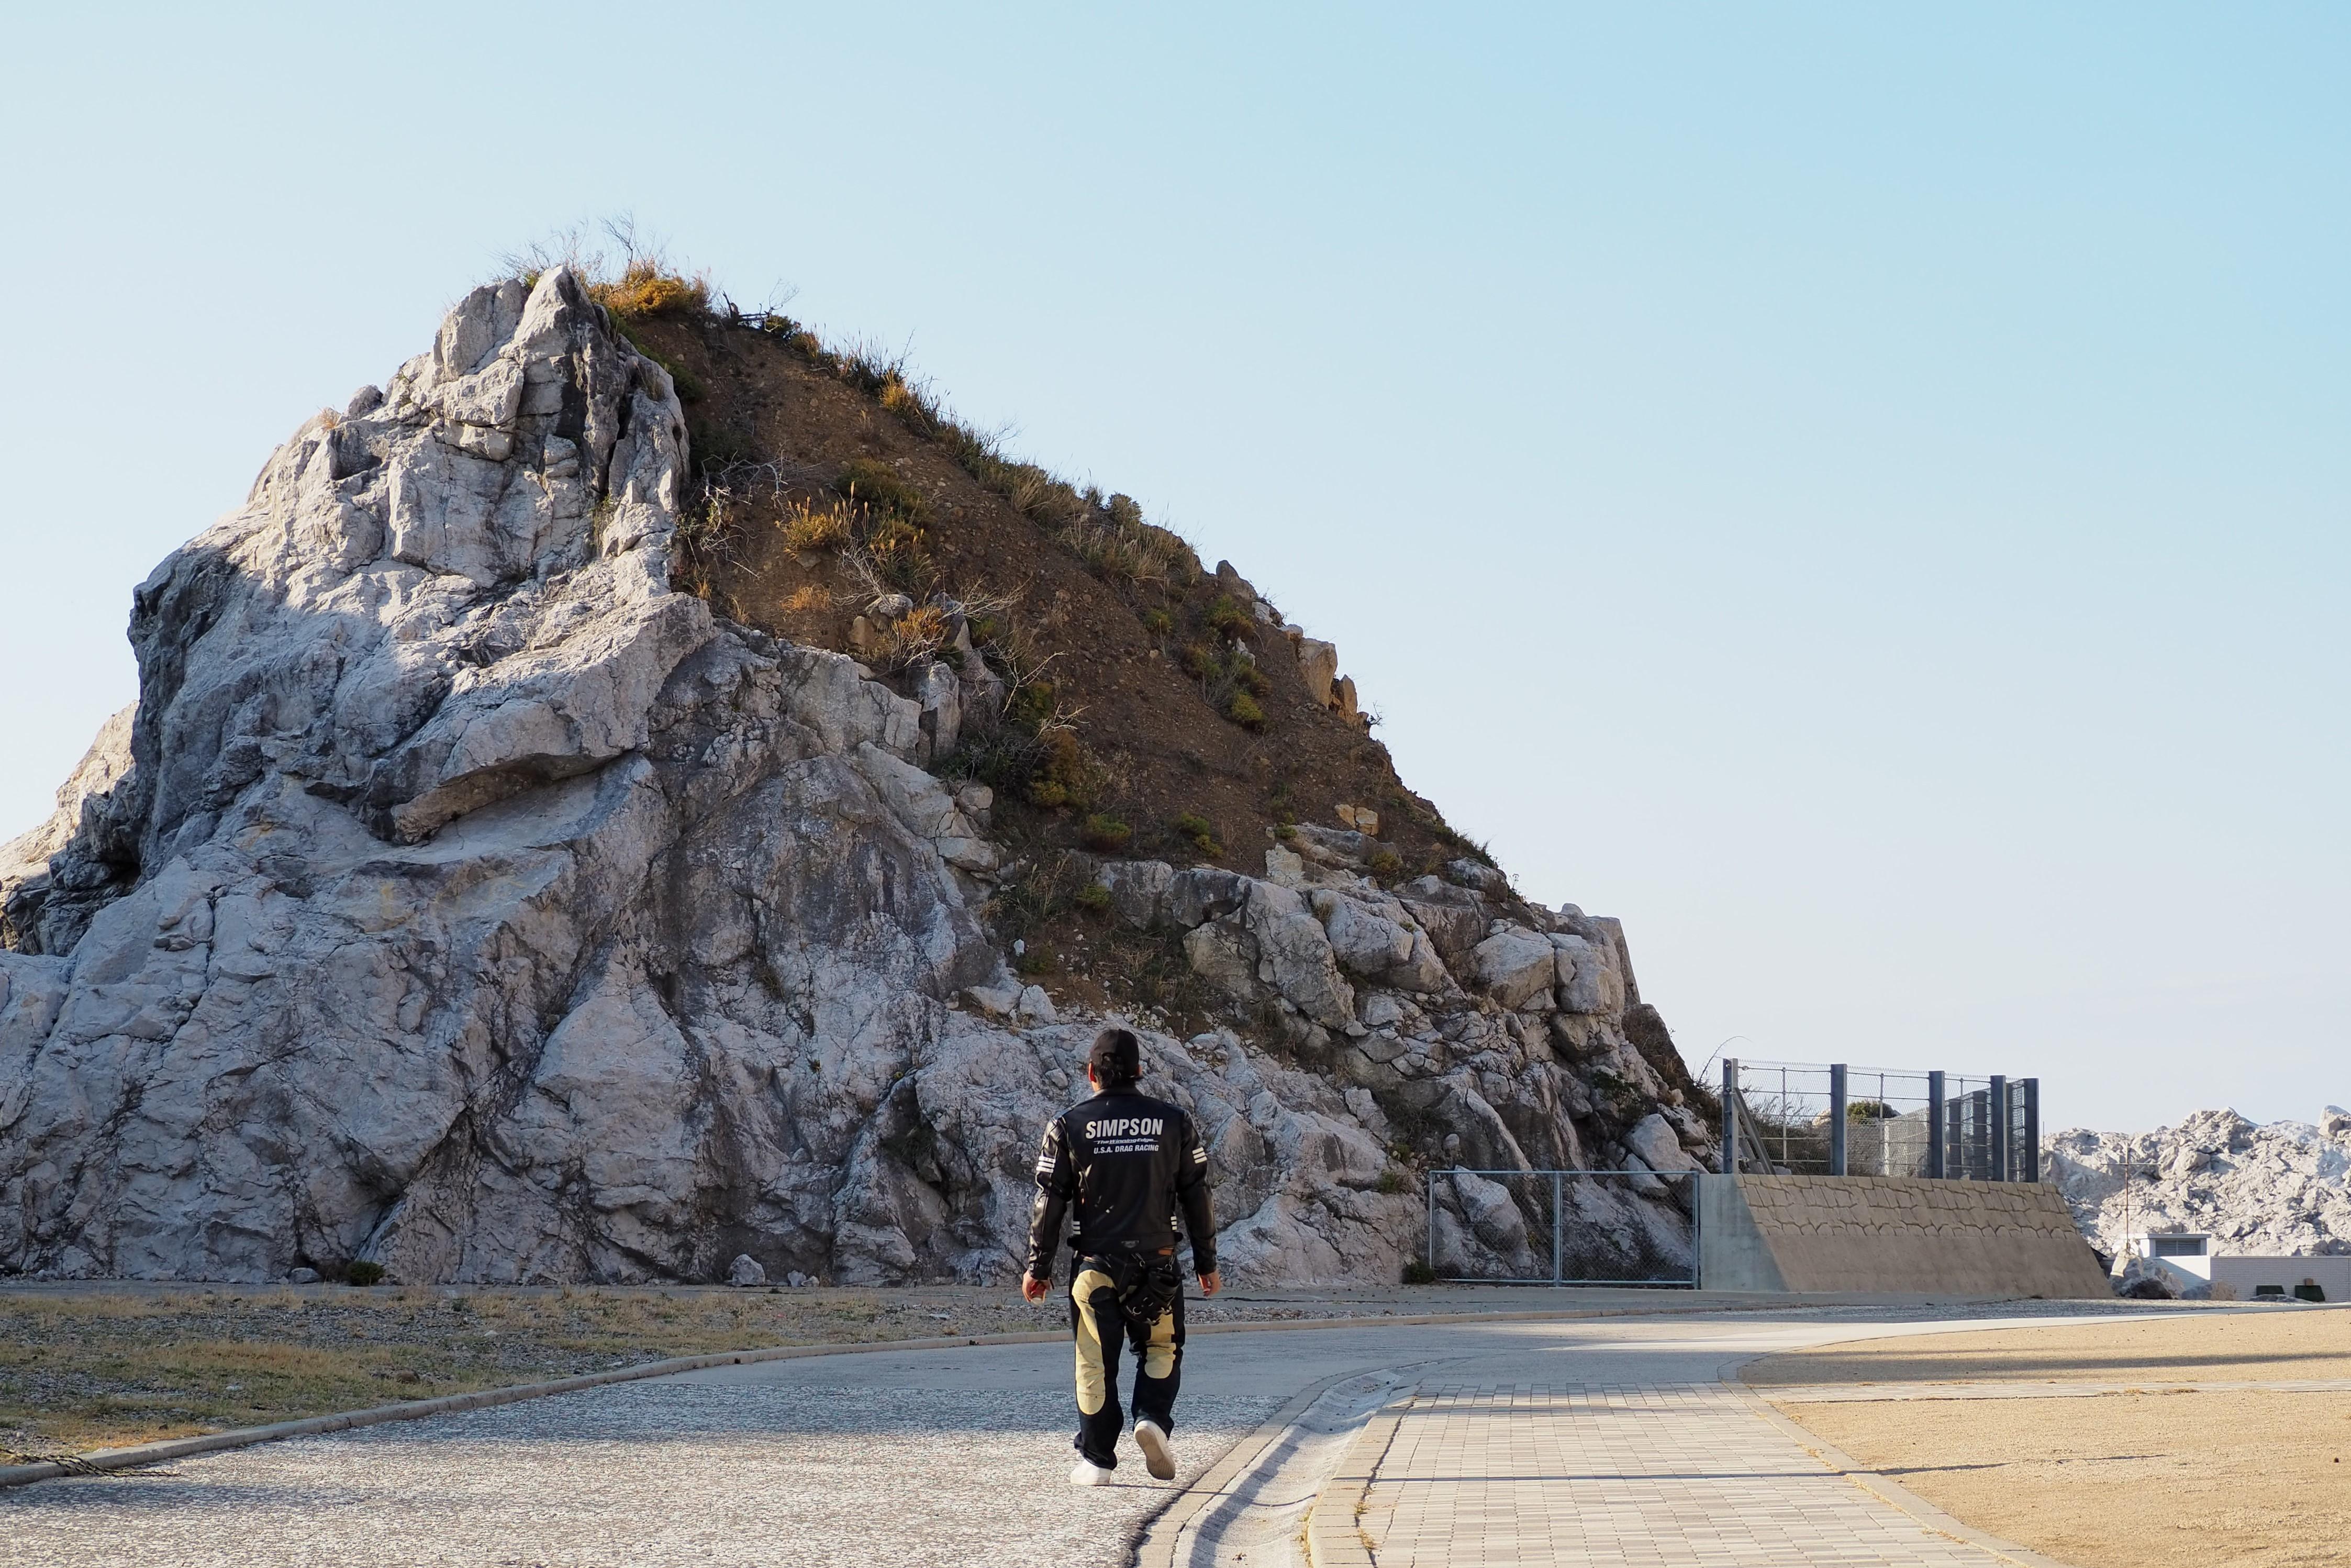 harleydavidson-motorcycle-touring-blog-wakayama-shirasakioceanpark-limestone-insidethepark.jpg